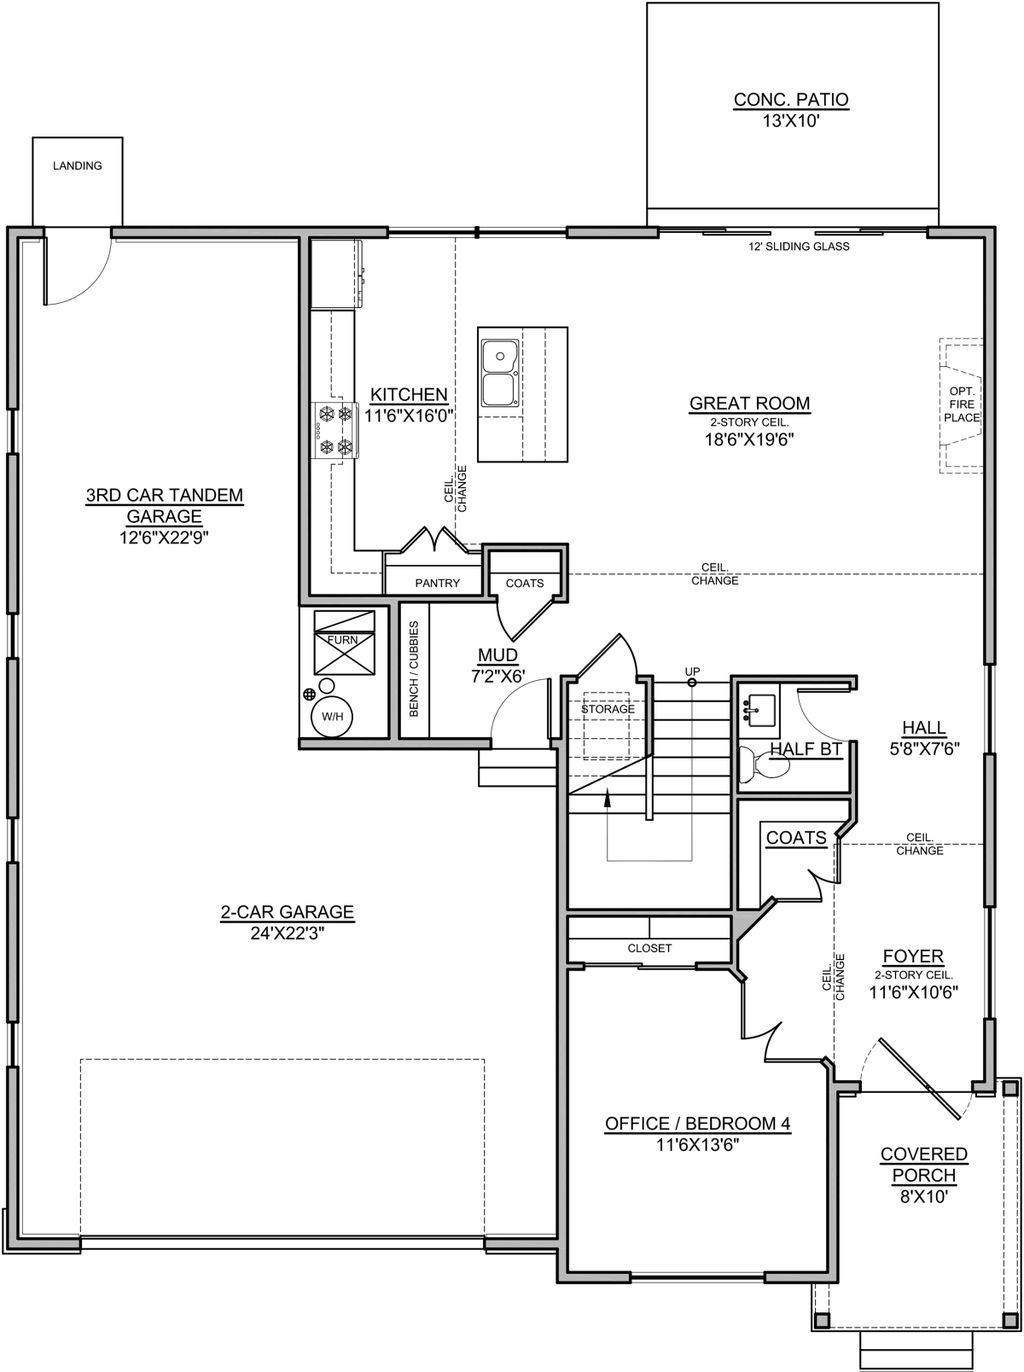 Craftsman Style House Plan 4 Beds 2 5 Baths 2381 Sq Ft Plan 1073 16 Blueprints Com